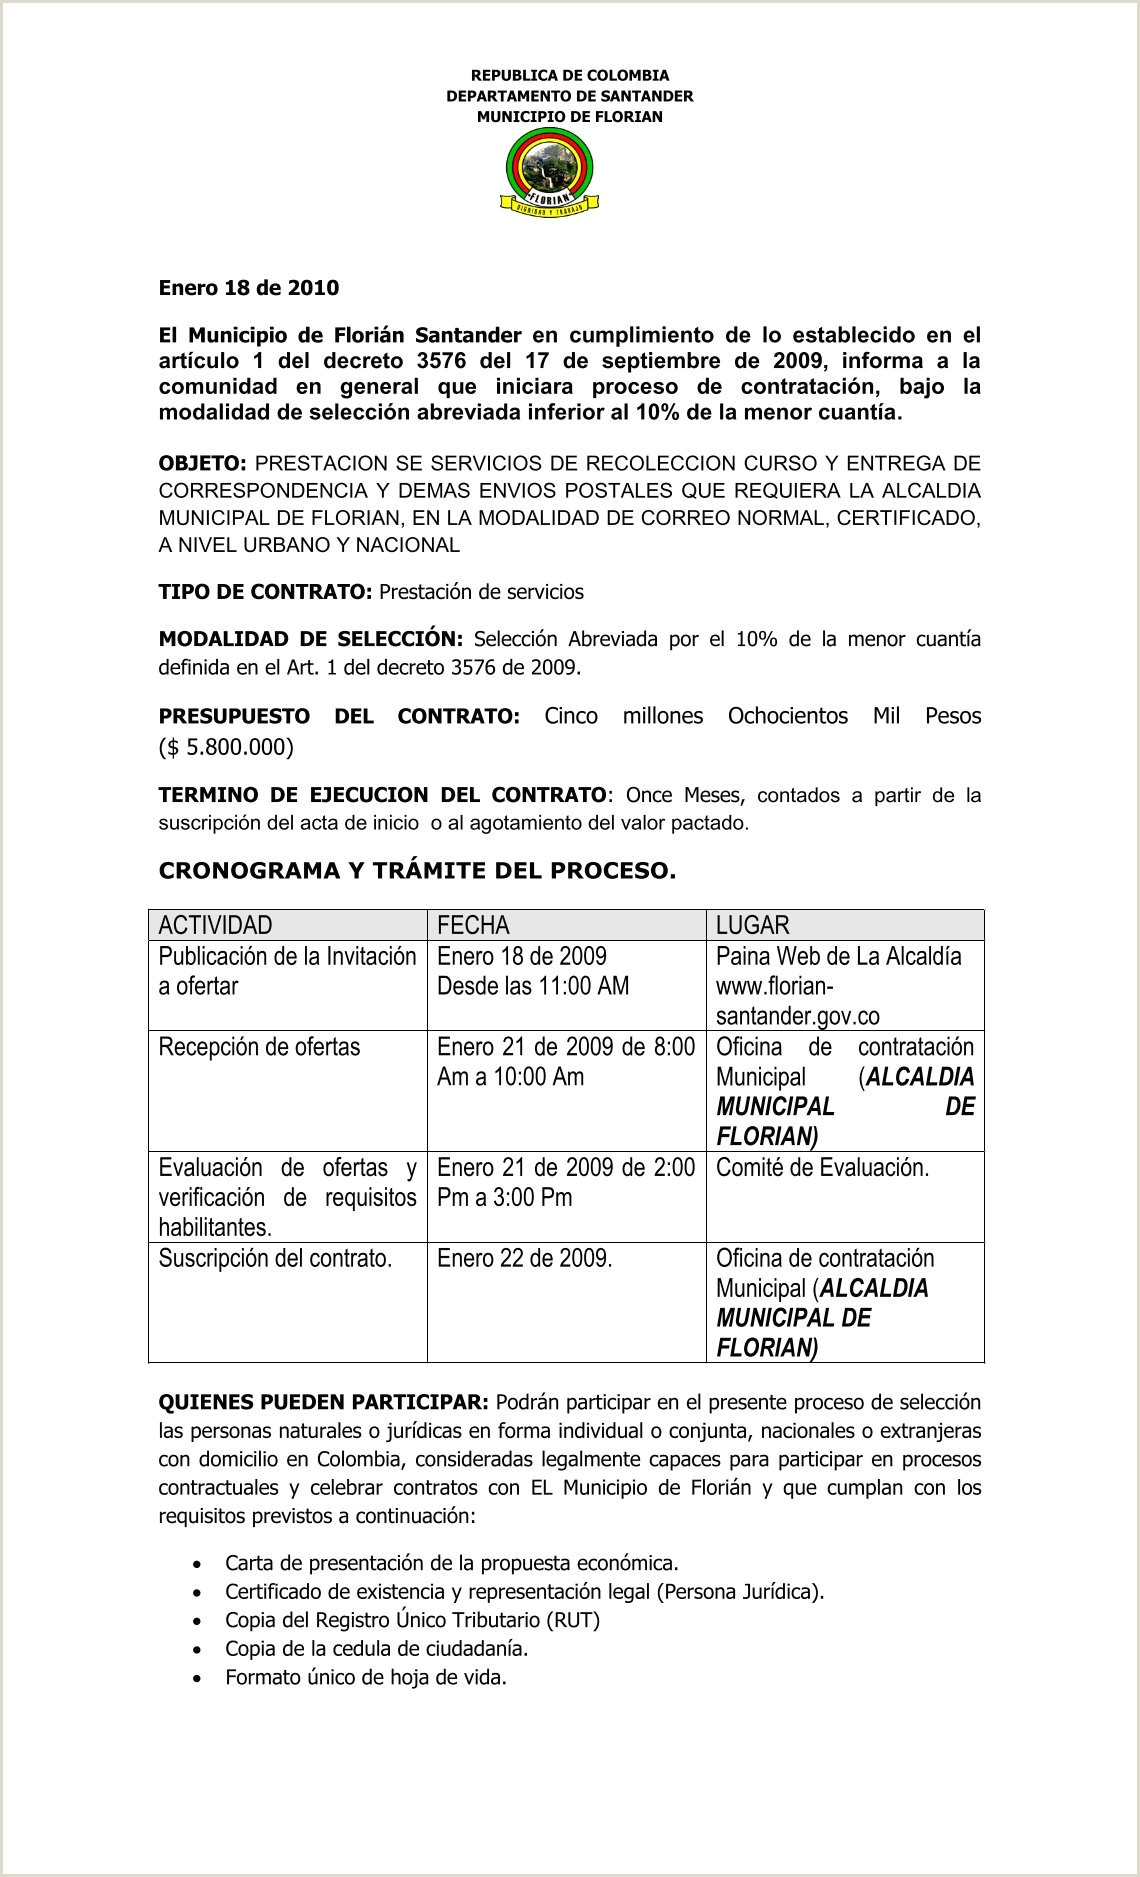 Formato Unico Hoja De Vida Persona Juridica Colombia 20 Free Magazines From Florian Santander Gov Co